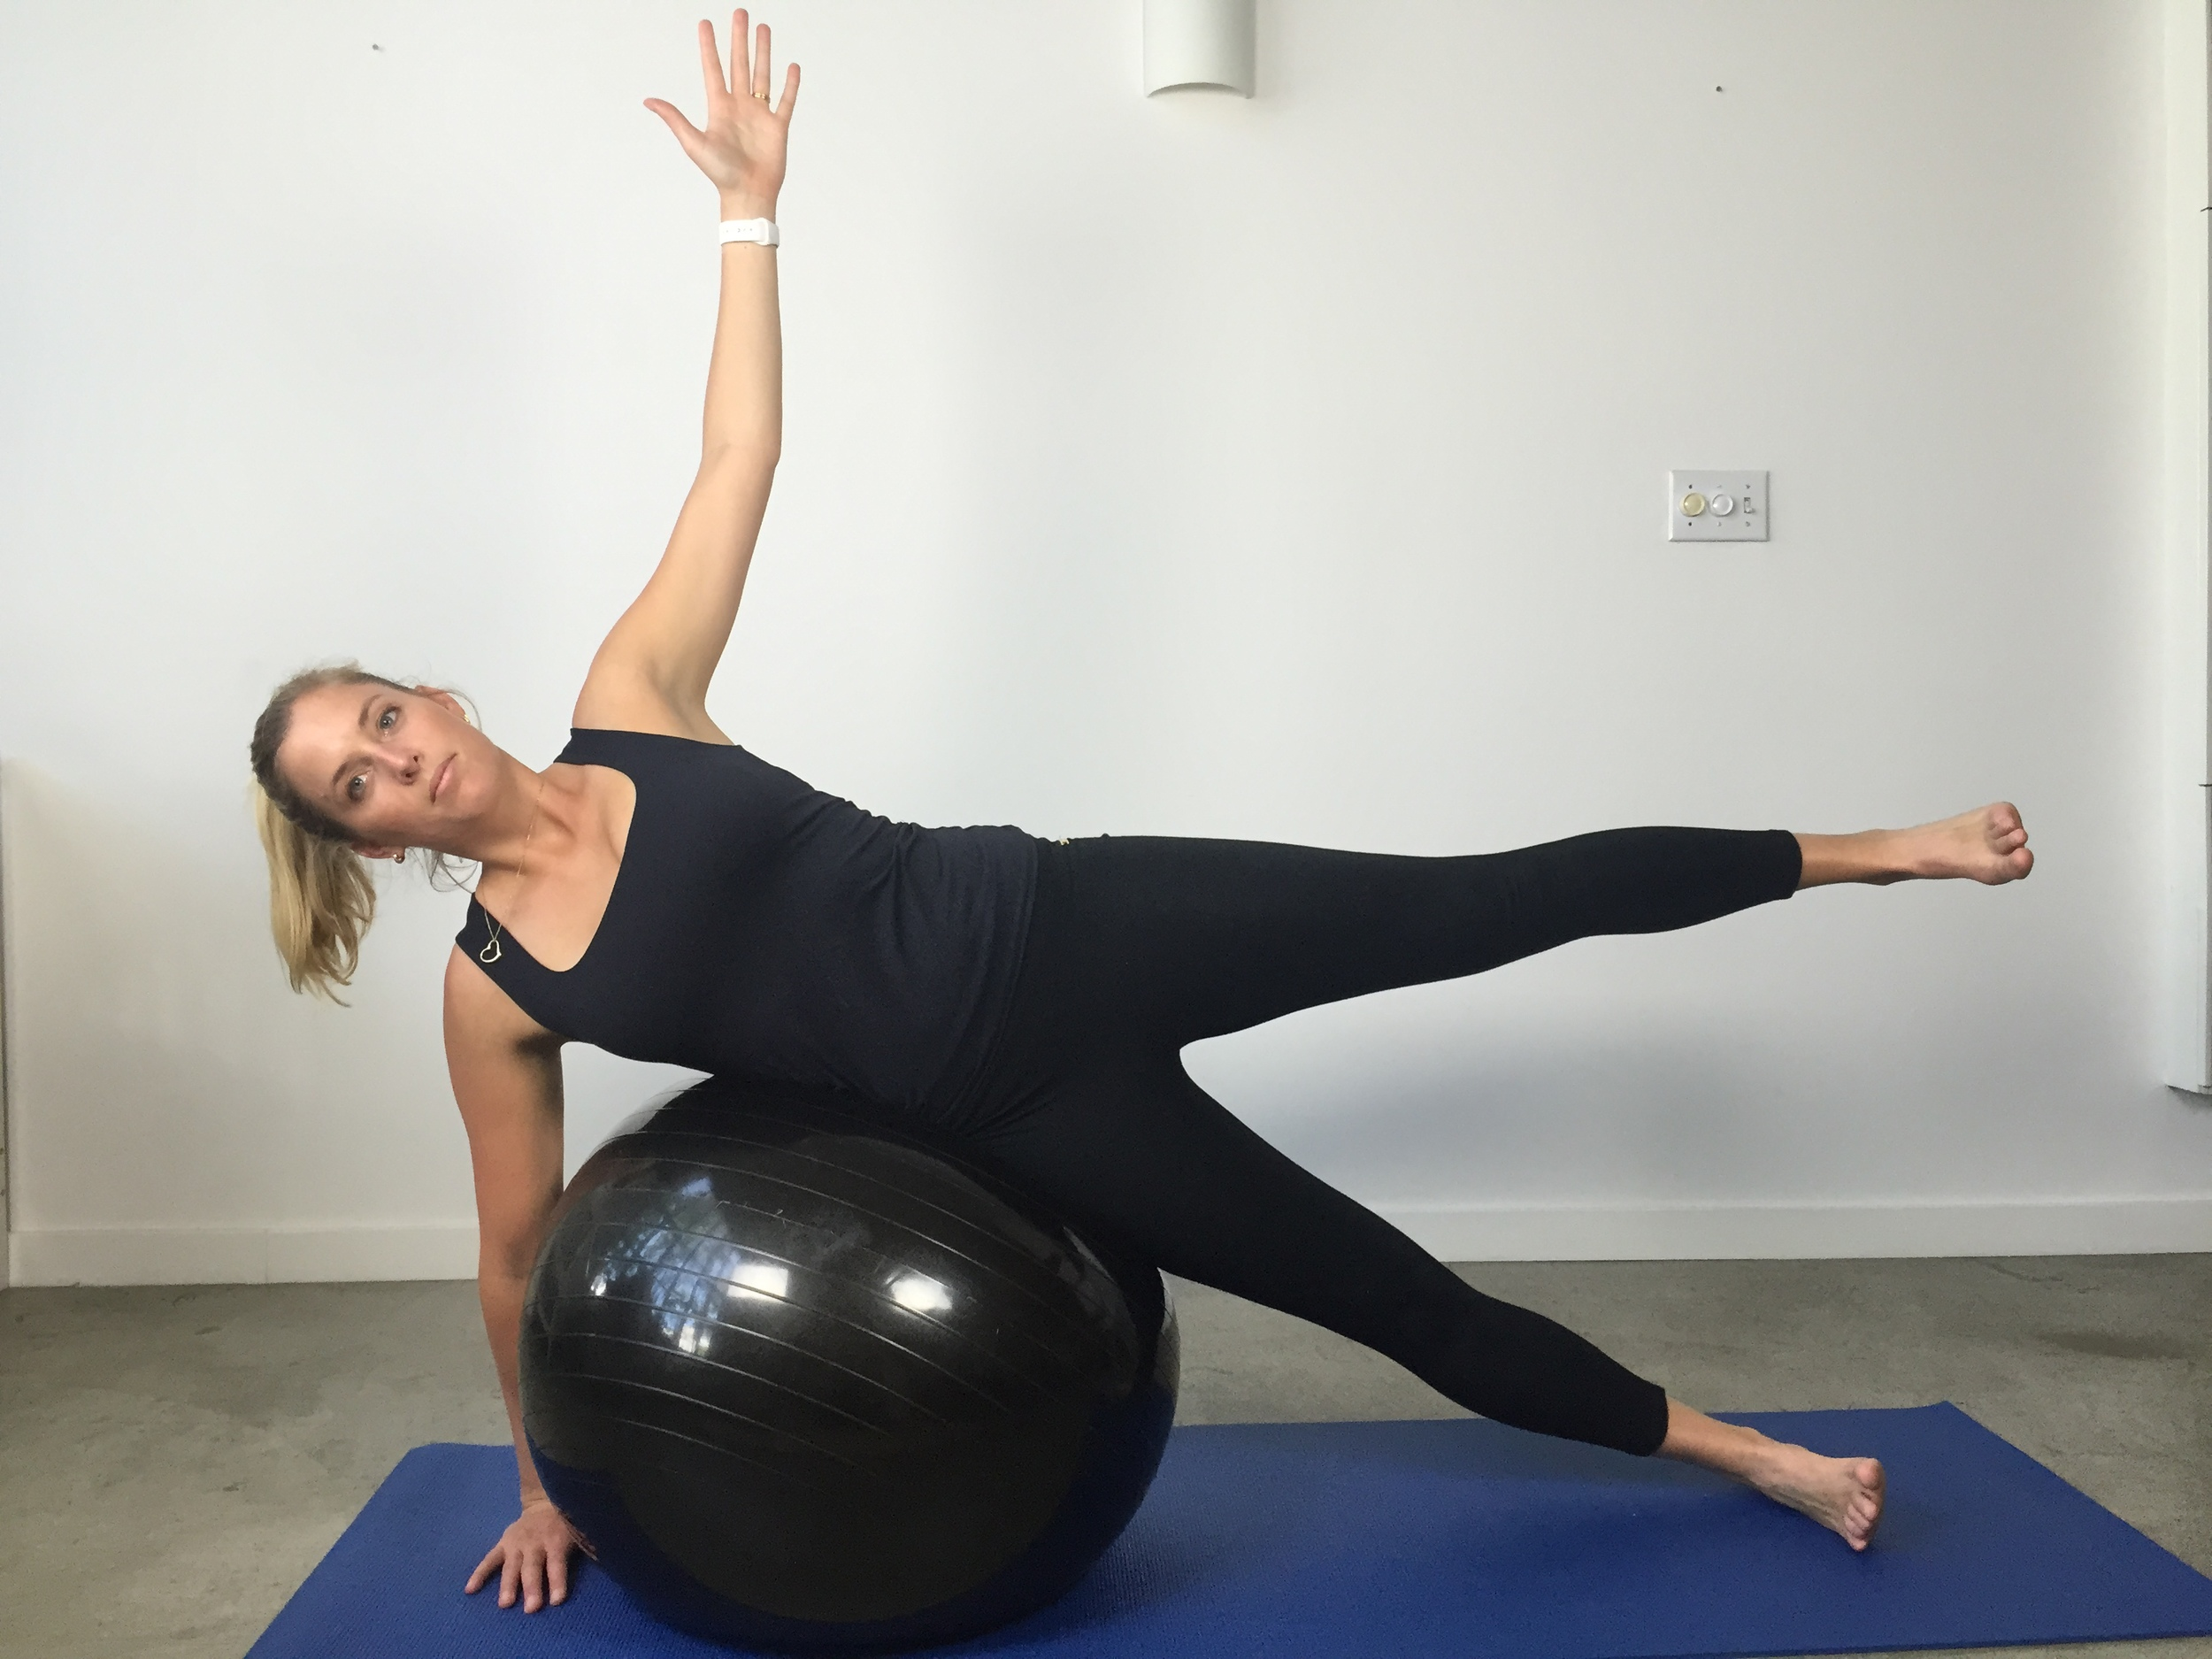 Side balance with leg raise